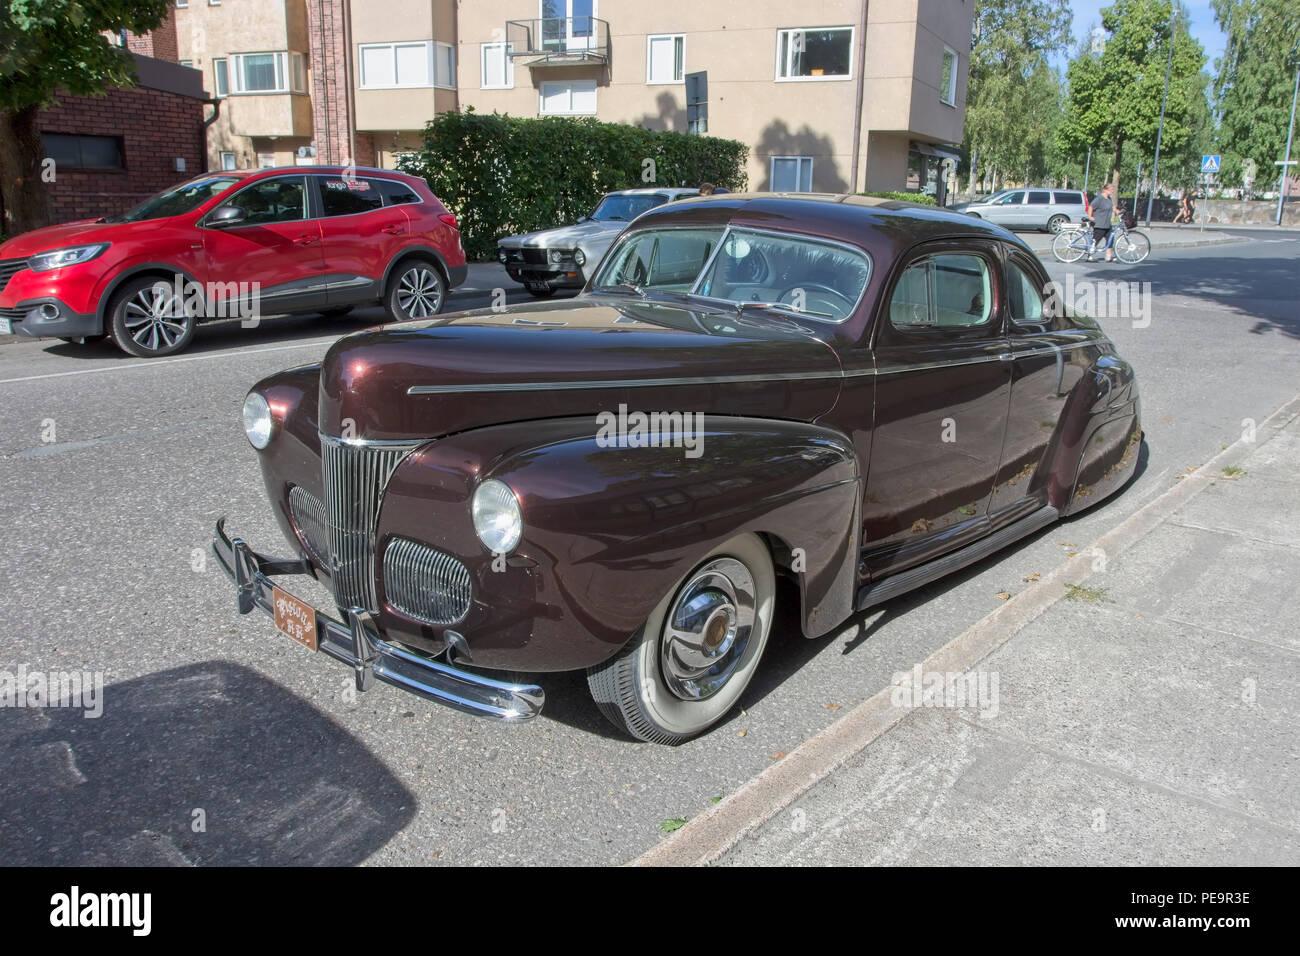 1941 Ford Business Coupe Hot Rod Stockfoto Bild 215345298 Alamy